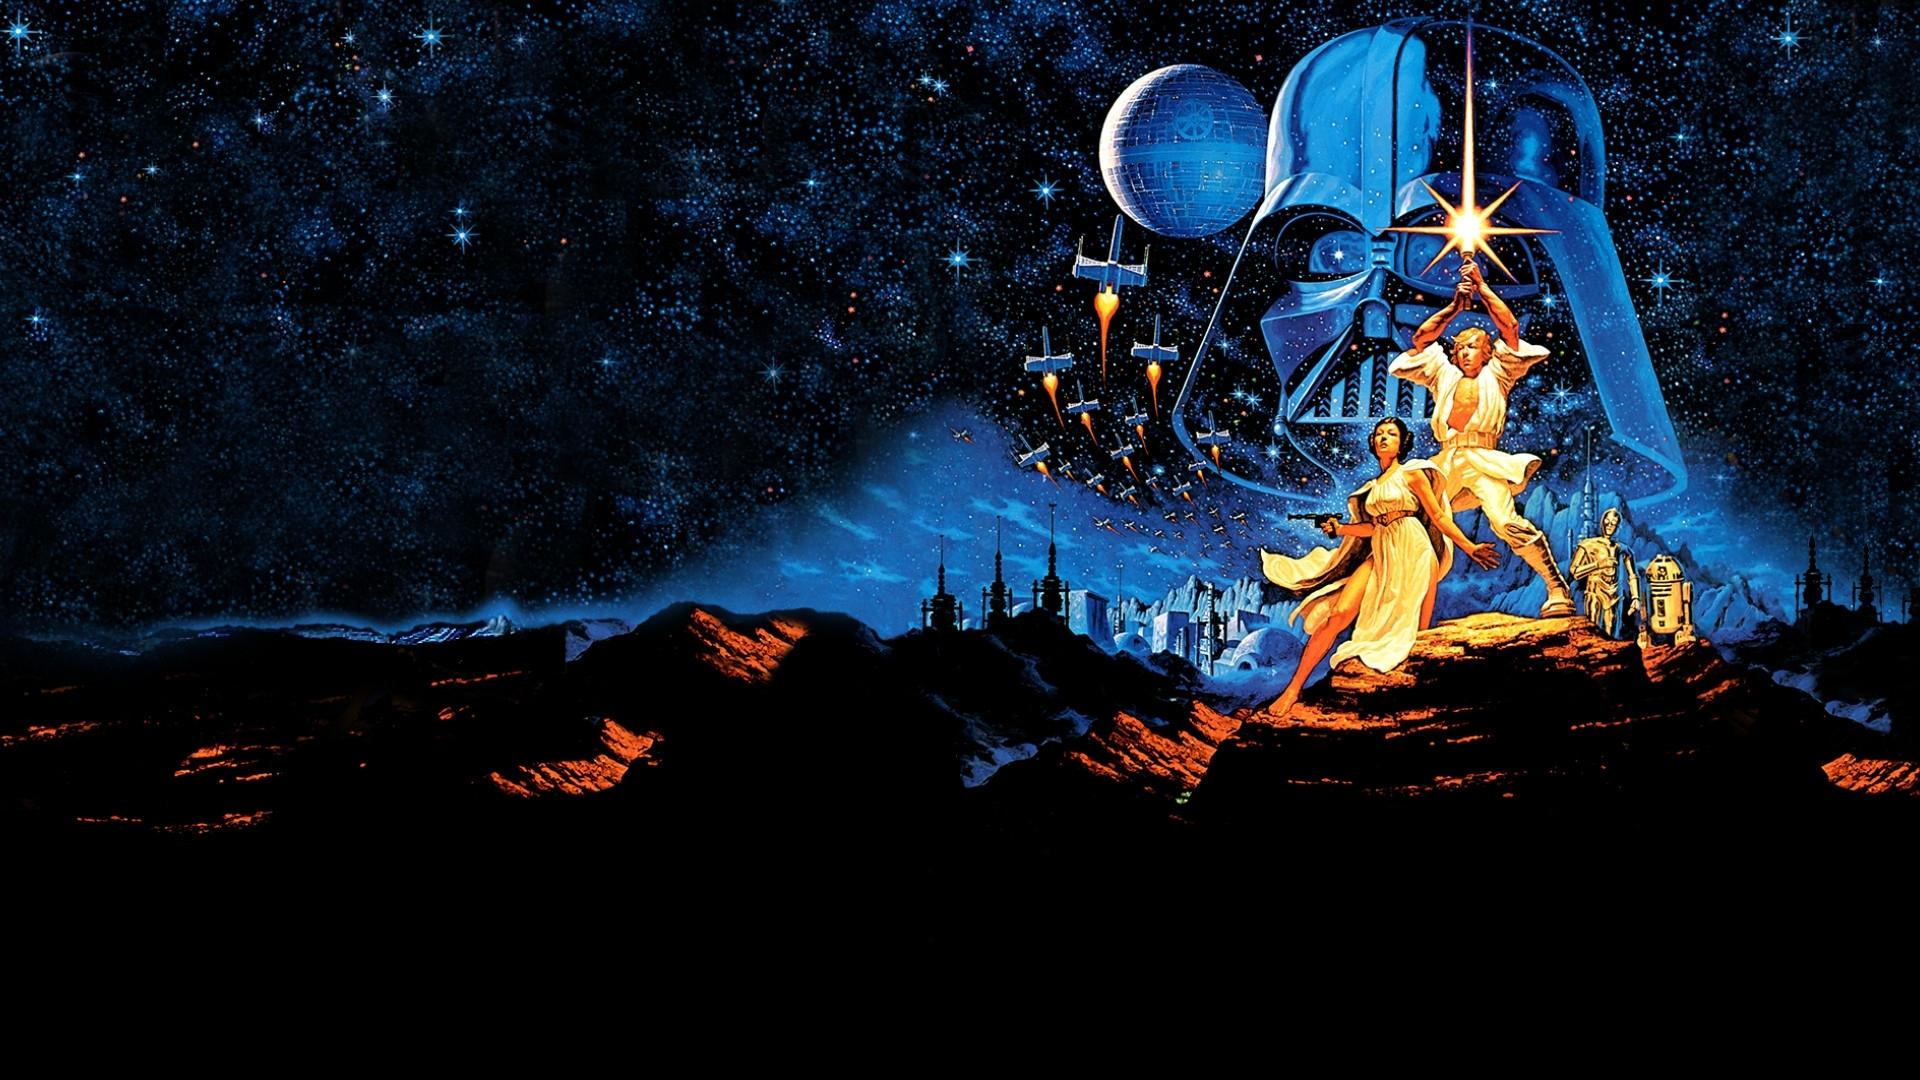 star wars wallpaper widescreen (70+ images)